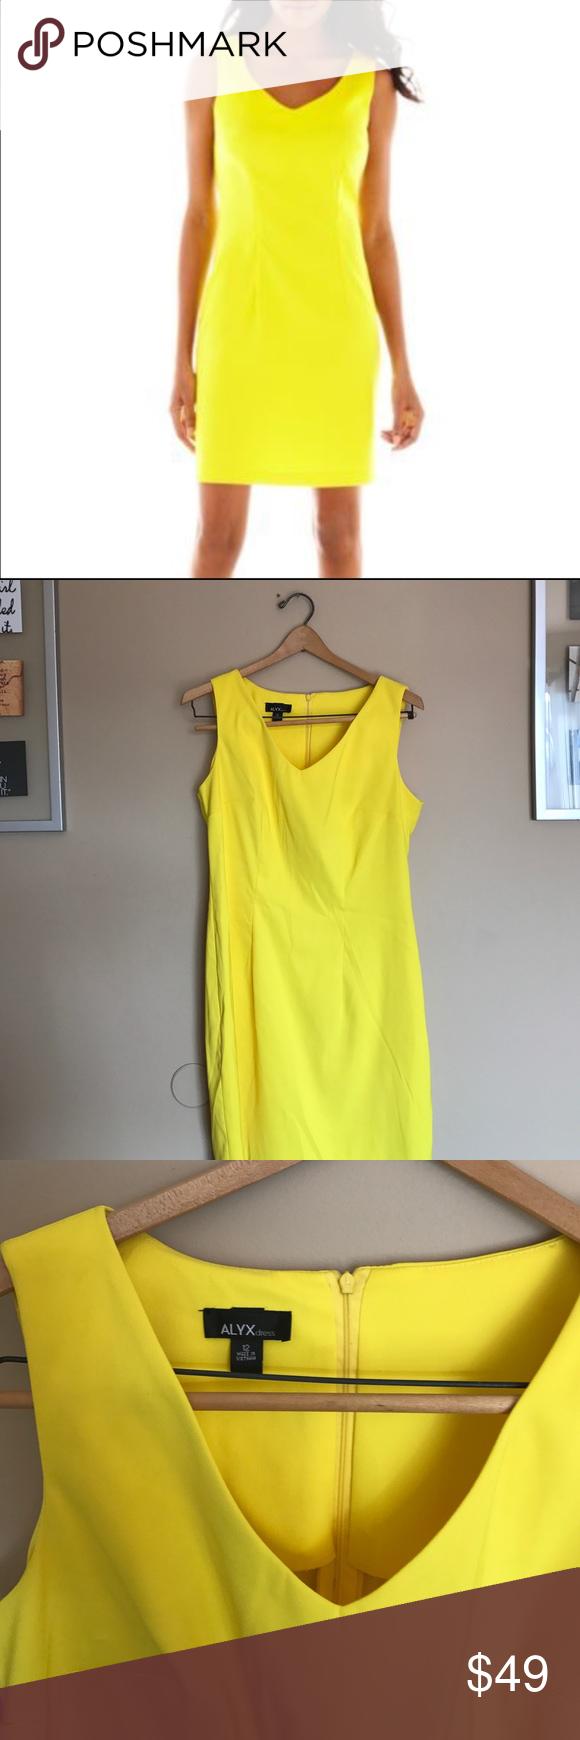 Alyx sleeveless yellow sheath vneck dress Alyx sleeveless yellow sheath vneck dress with zip back. Sleek, bright and beautiful. 97% polyester 3% spandex blend. Related: yellow dress, work dress, bridal shower, wedding shower, baby shower, rehearsal dinner, spring dress, summer dress, beautiful dress . Alyx Dresses